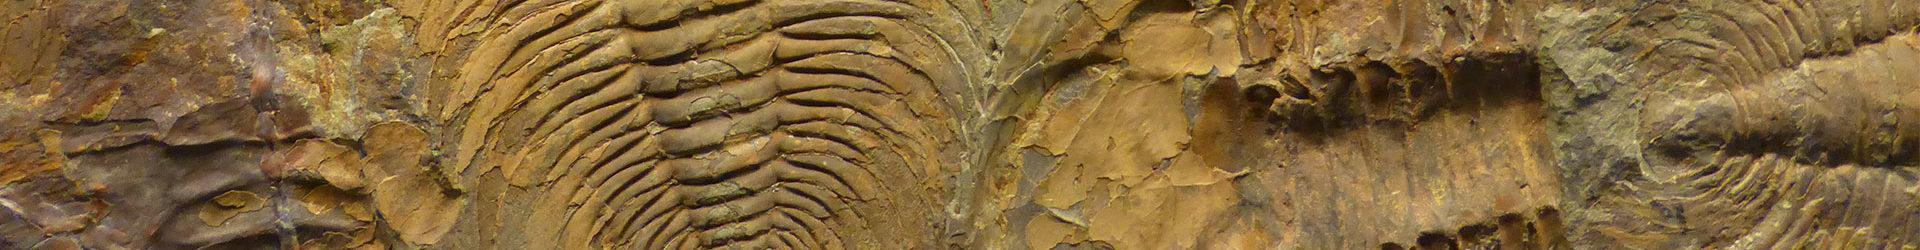 Best Fossils